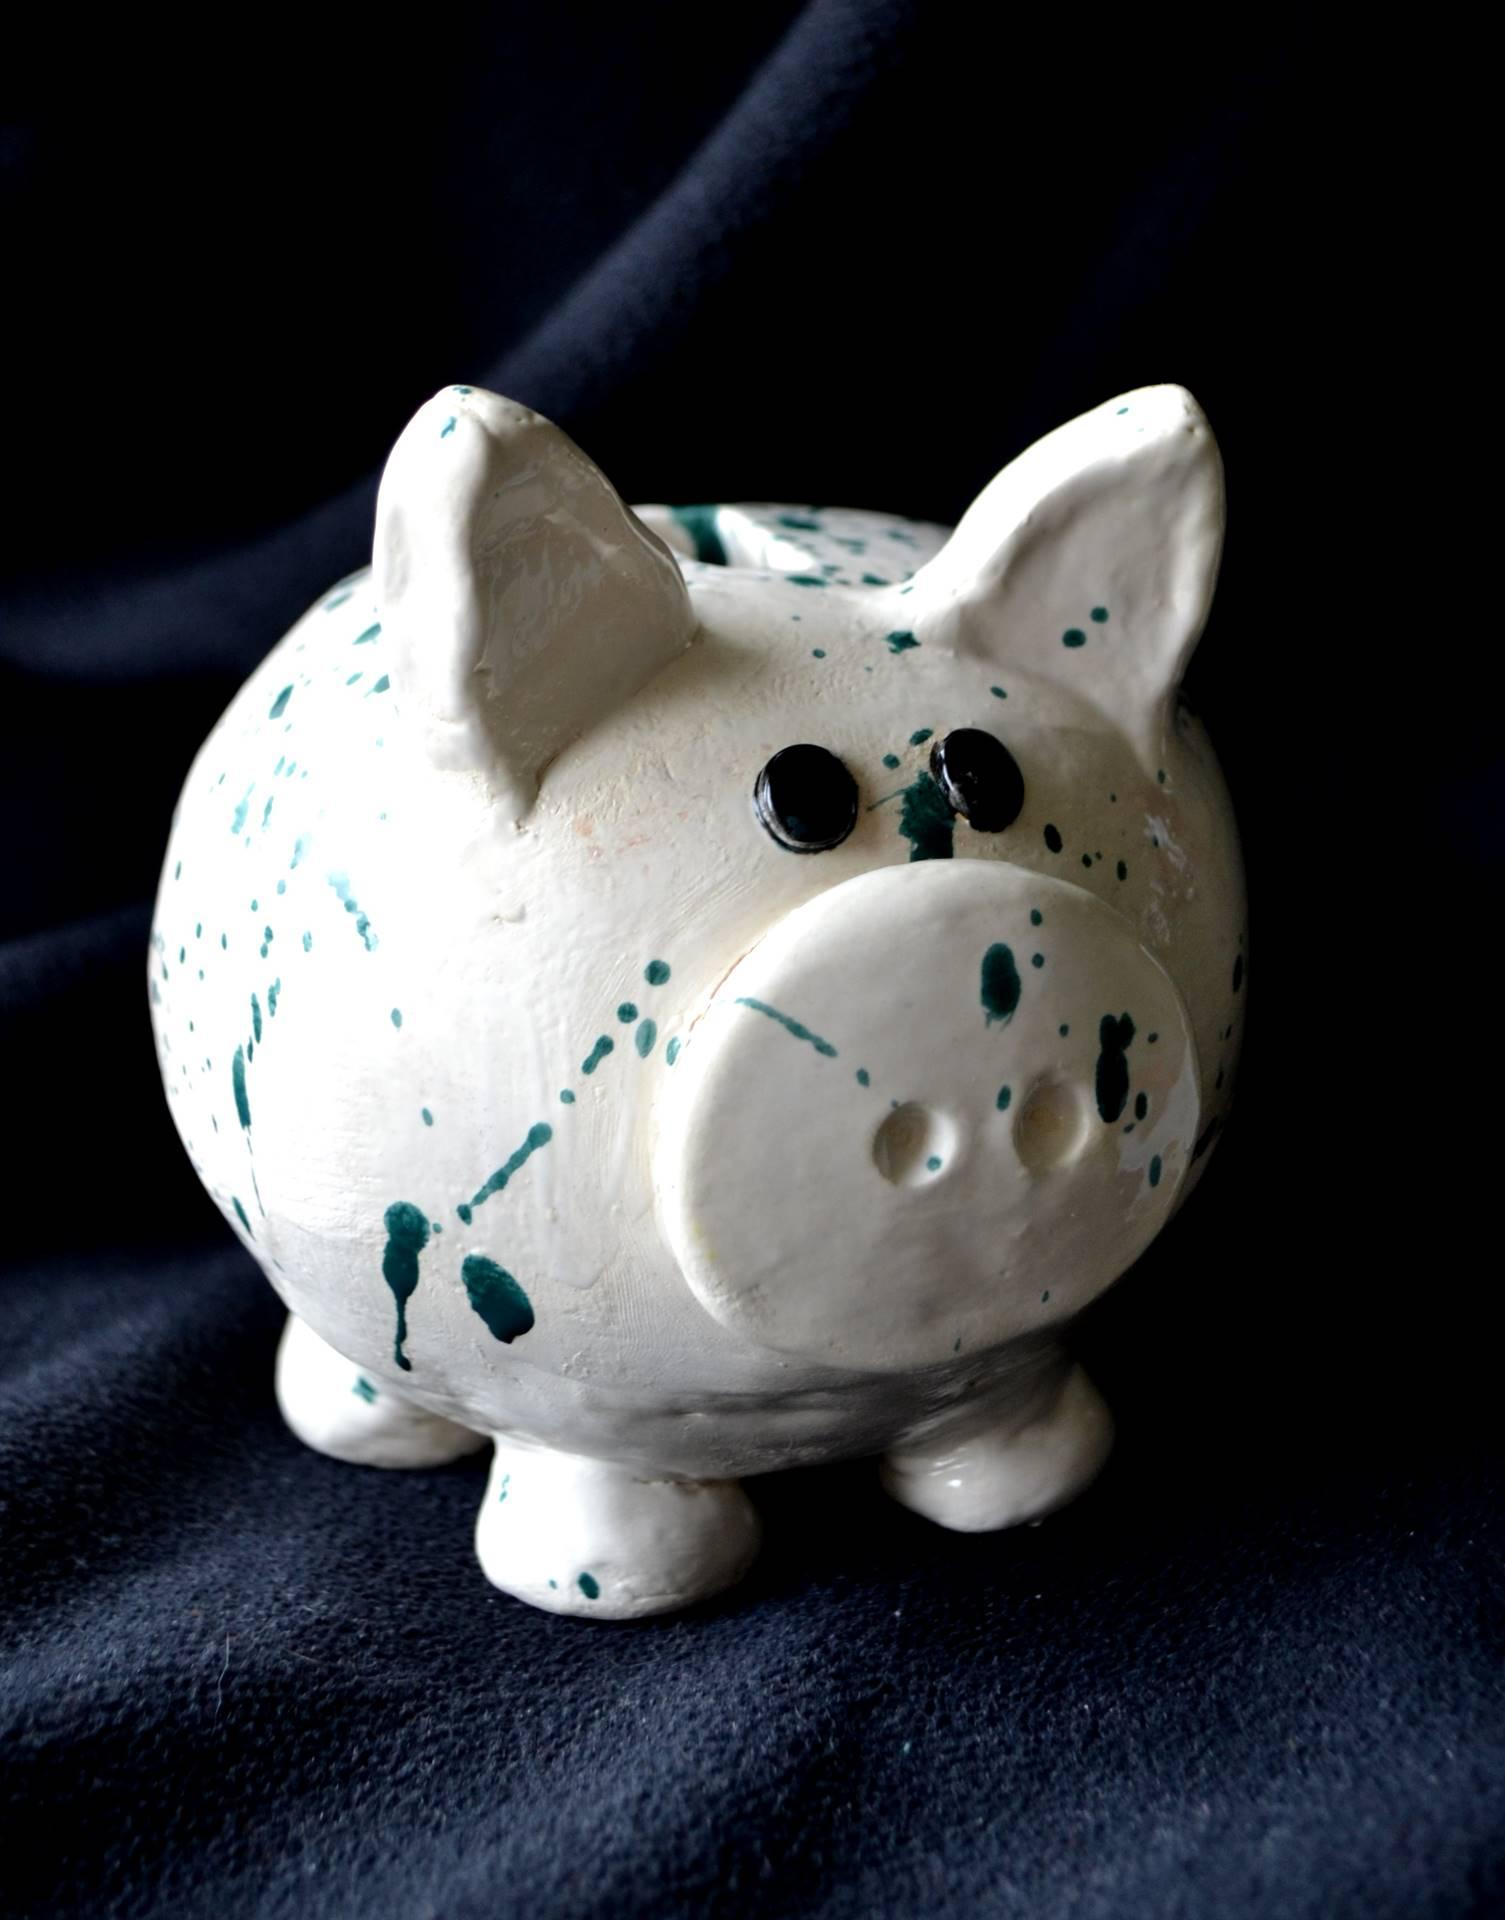 Sarah Bessett, Piggy Bank, glazed ceramic, 2017